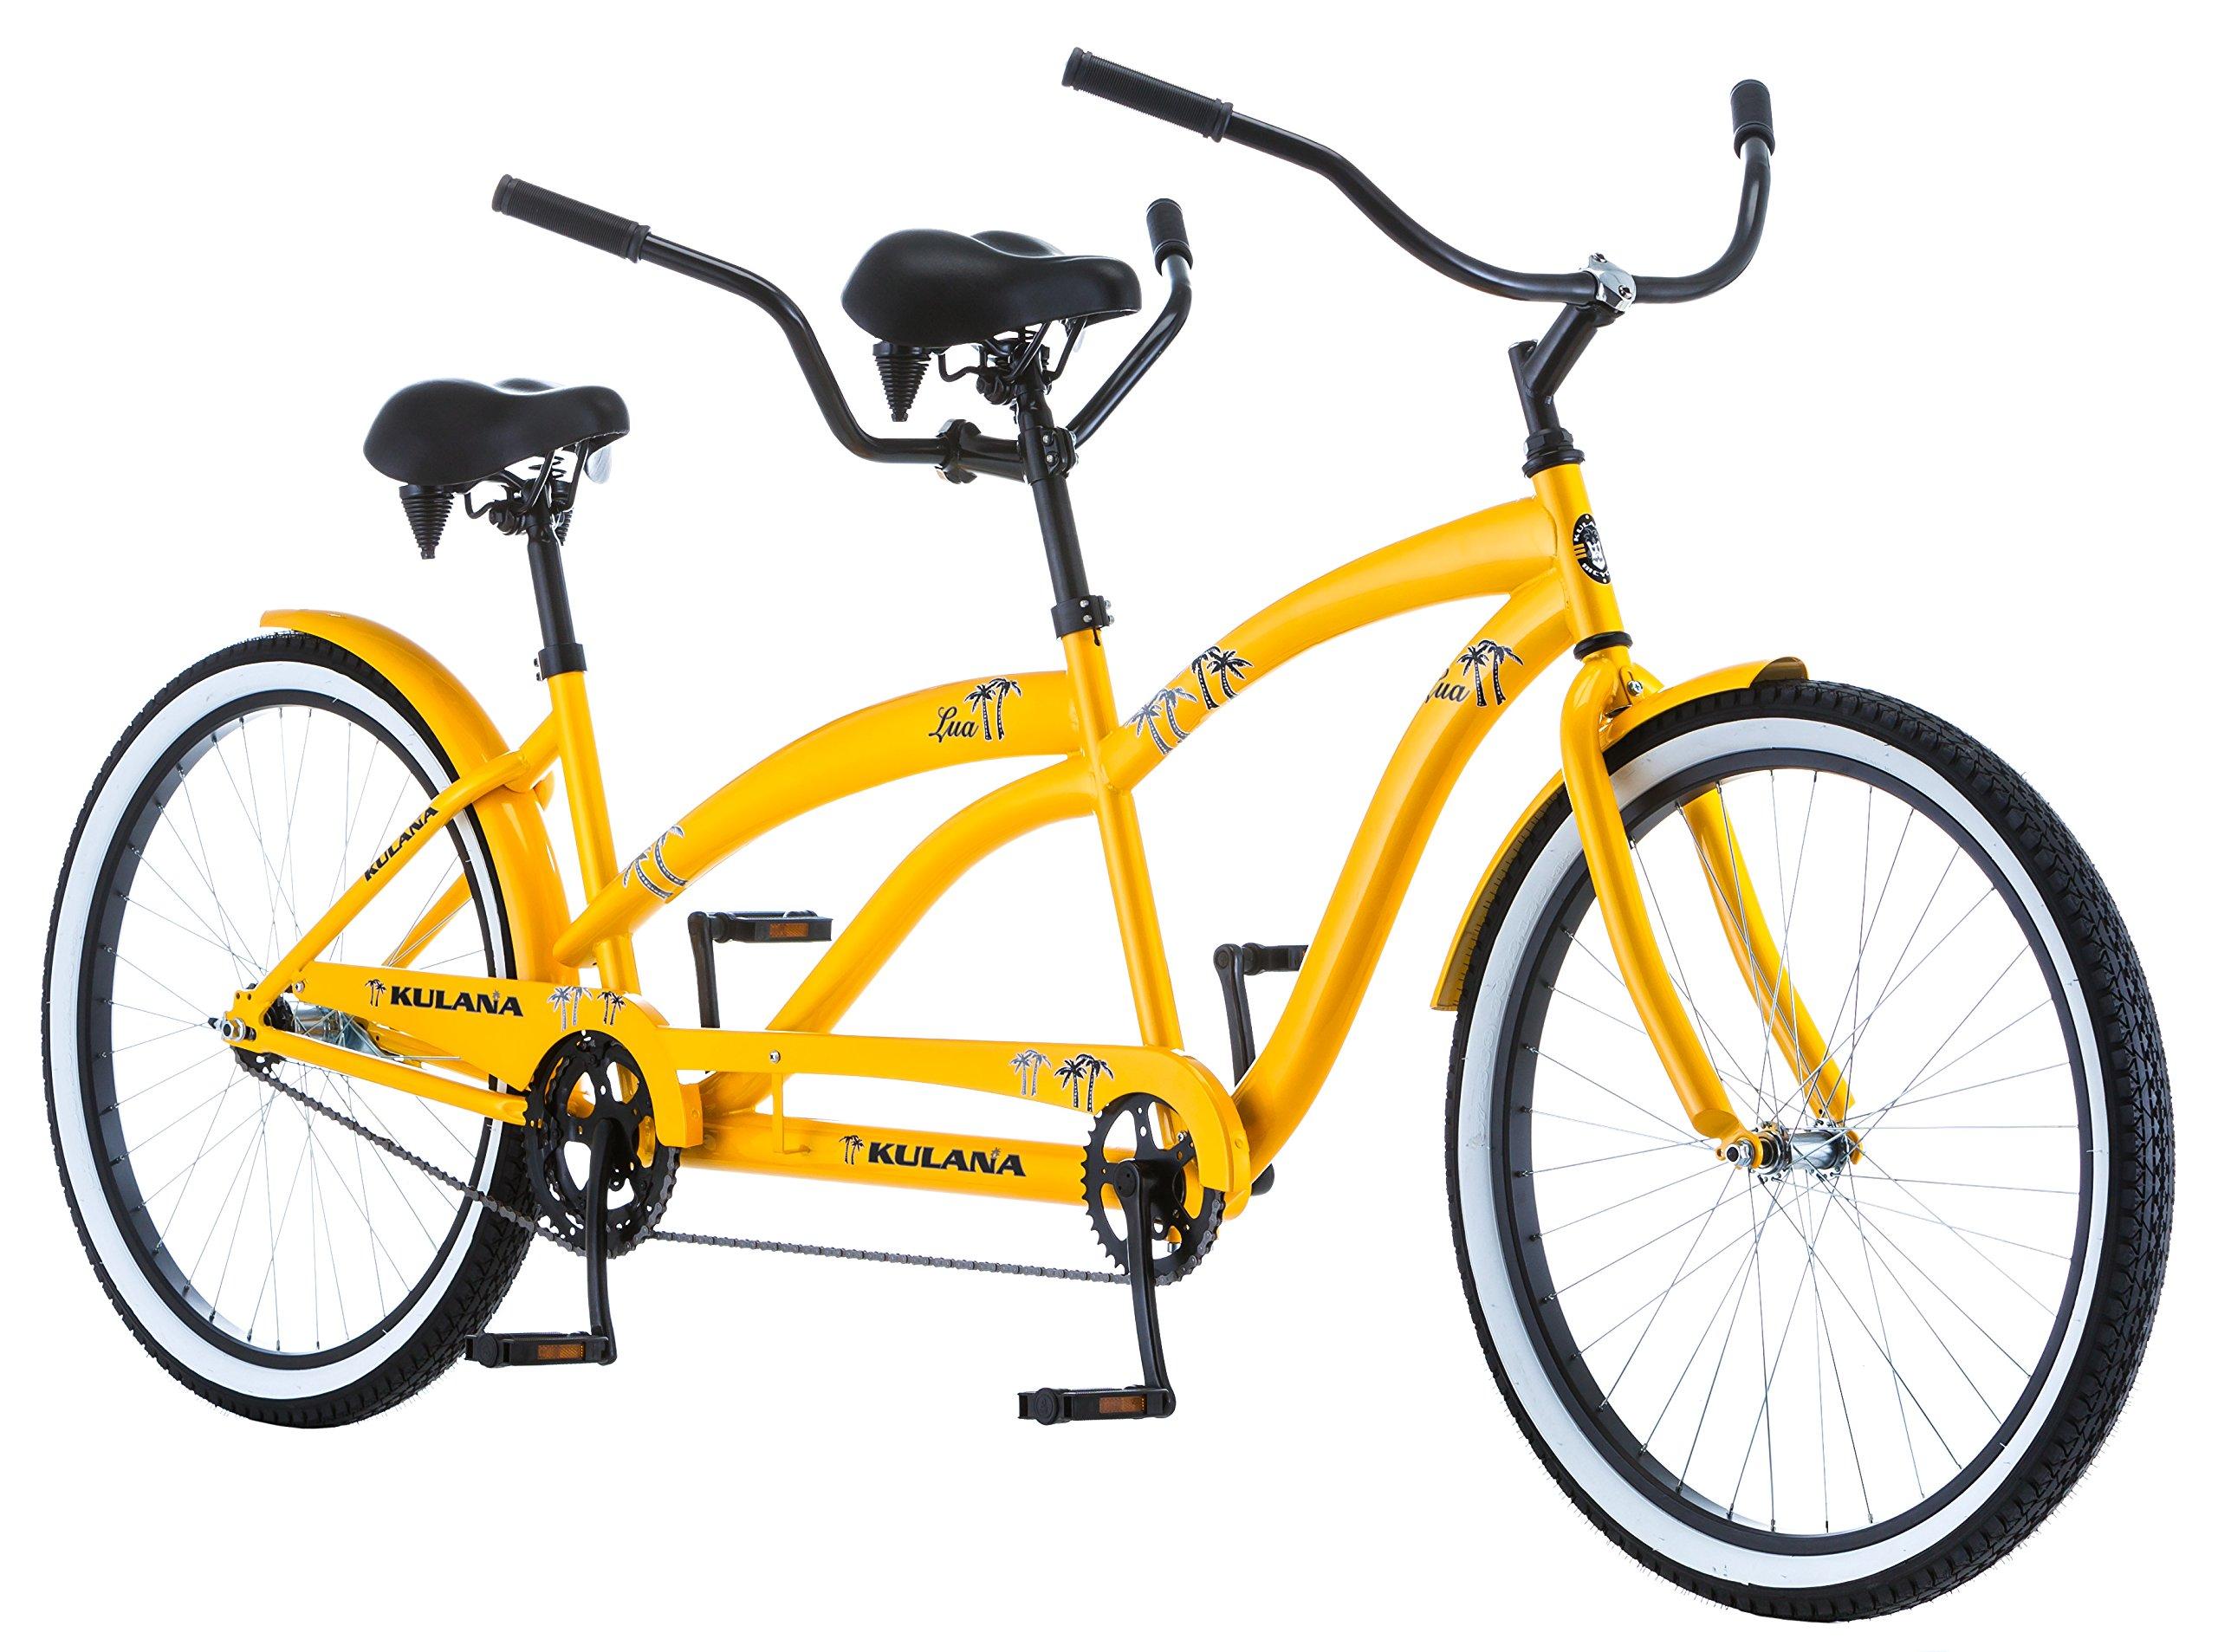 "Kulana Lua Single Speed Tandem 26"" wheel, Yellow, 17''/Medium frame size"